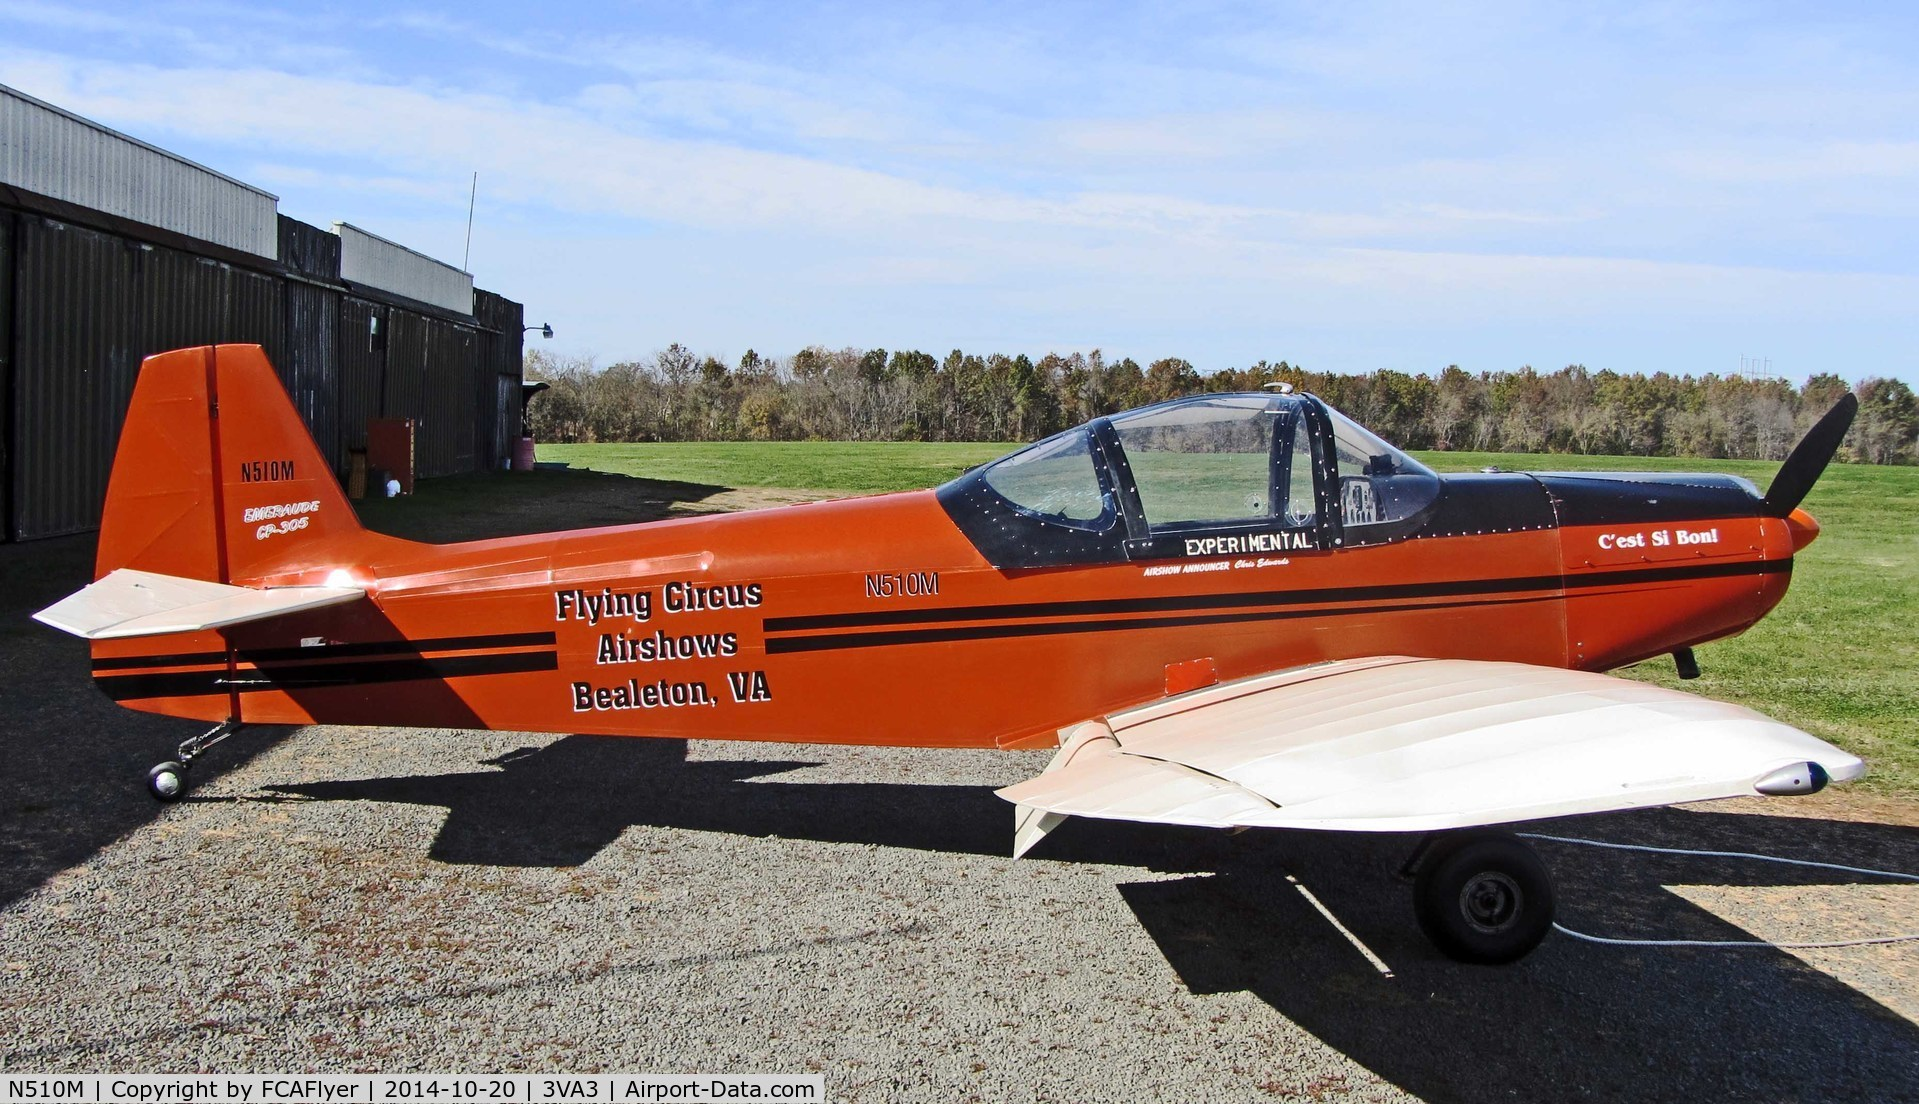 N510M, 1971 Piel CP-305 Emeraude C/N 1171, CP-305, built by Bernard Miller 1971, Lycoming 0-235